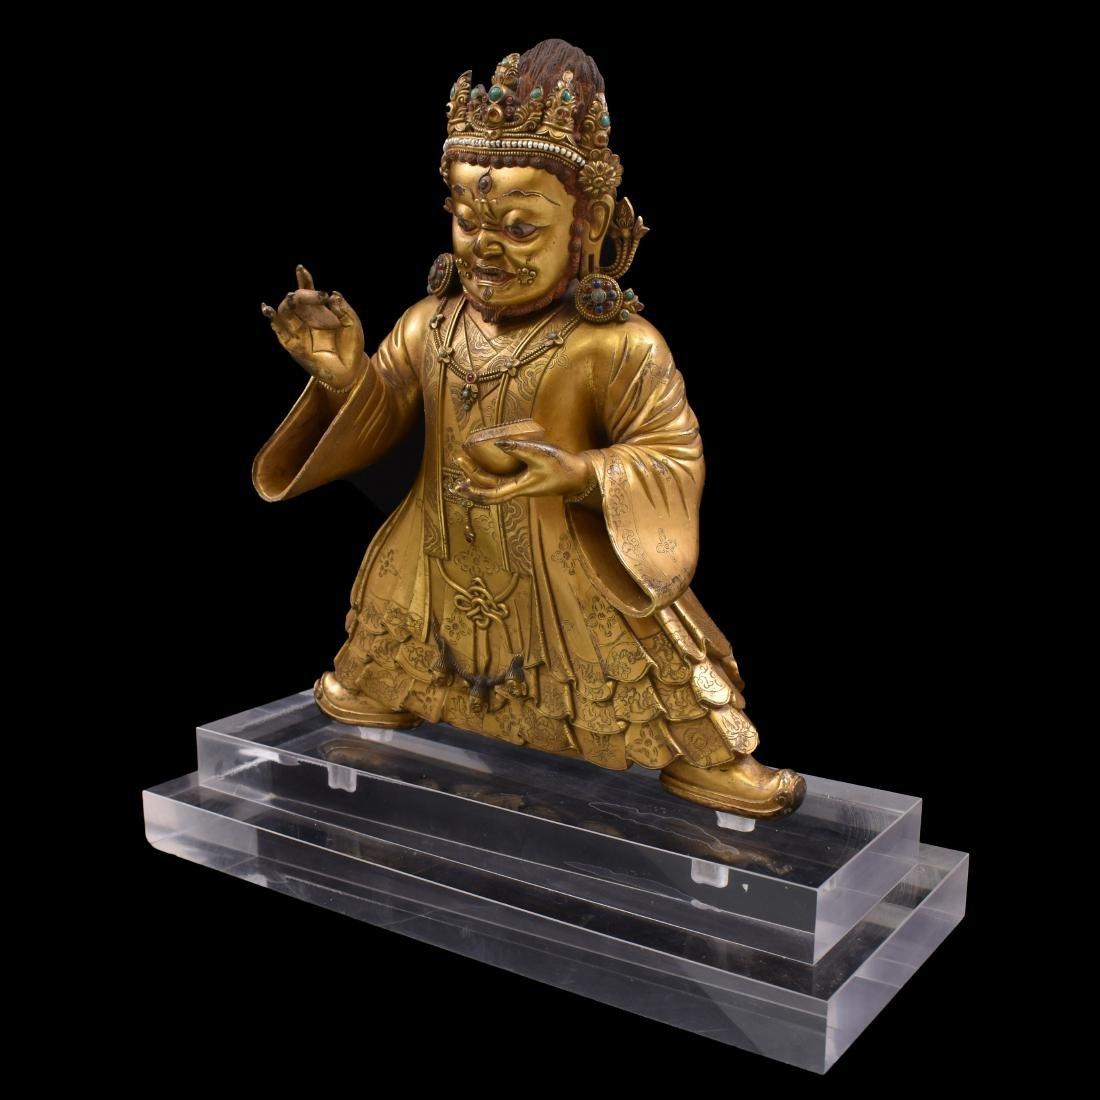 MING GILT BRONZE & STONES INLAID BUDDHA VAISHRAVANA - 11